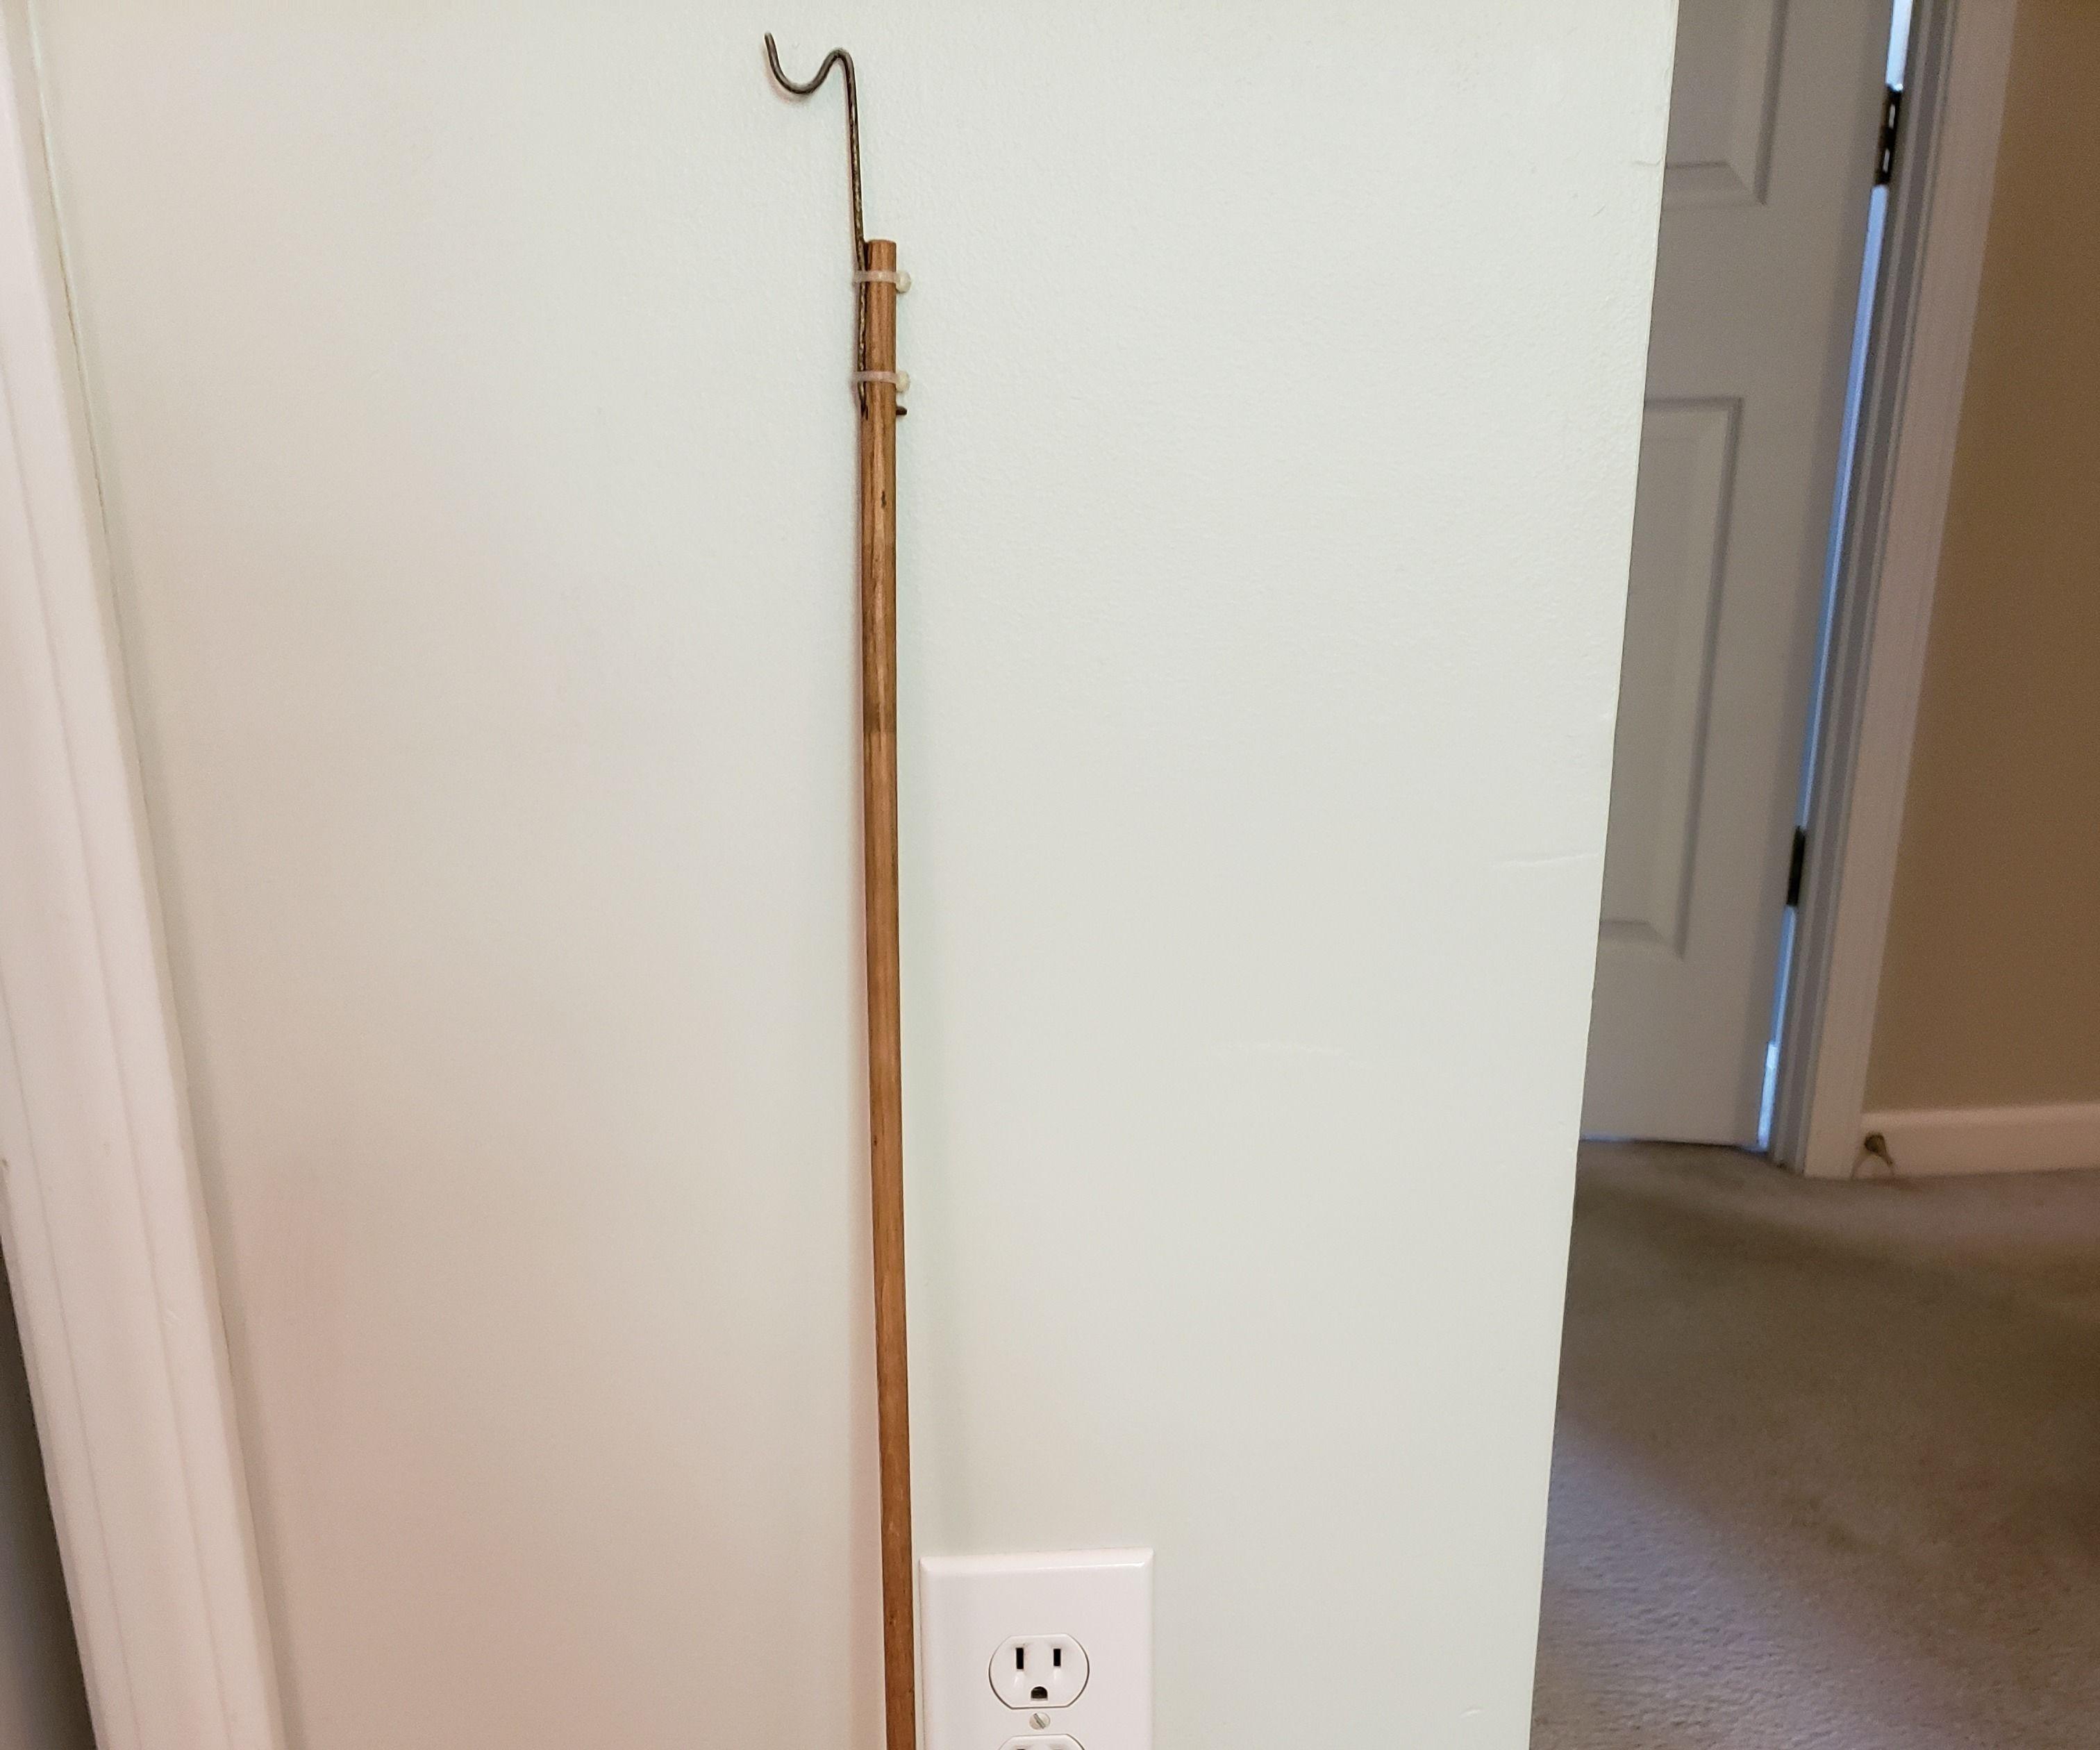 Handy Push/pull Hook Stick